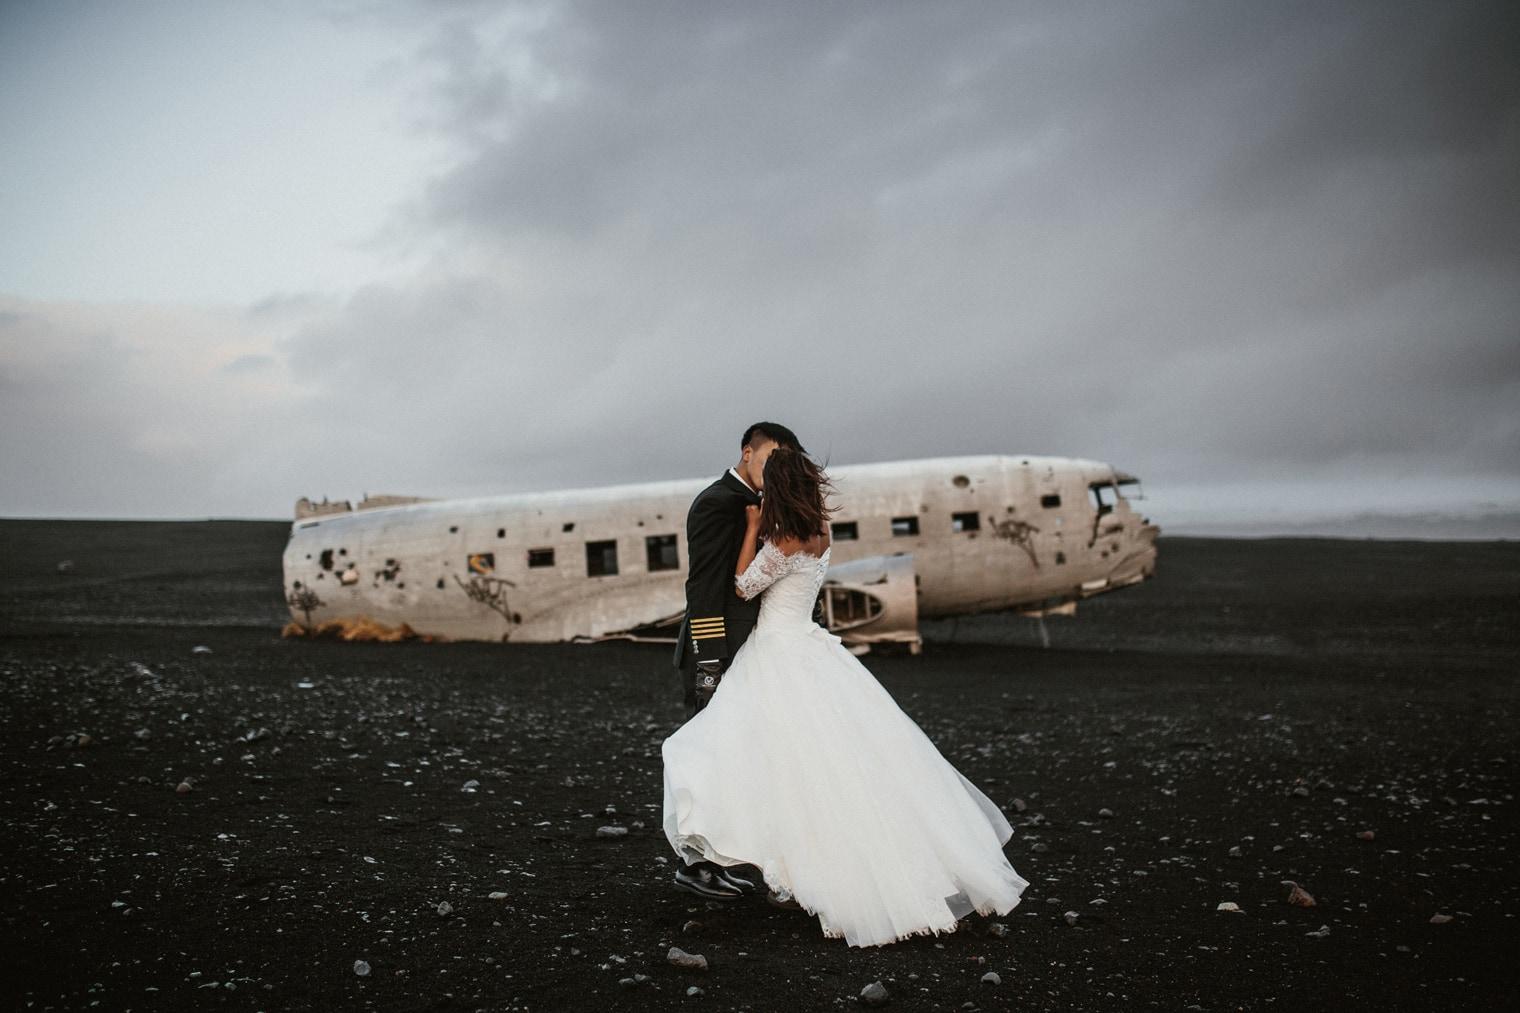 iceland plane wreck wedding